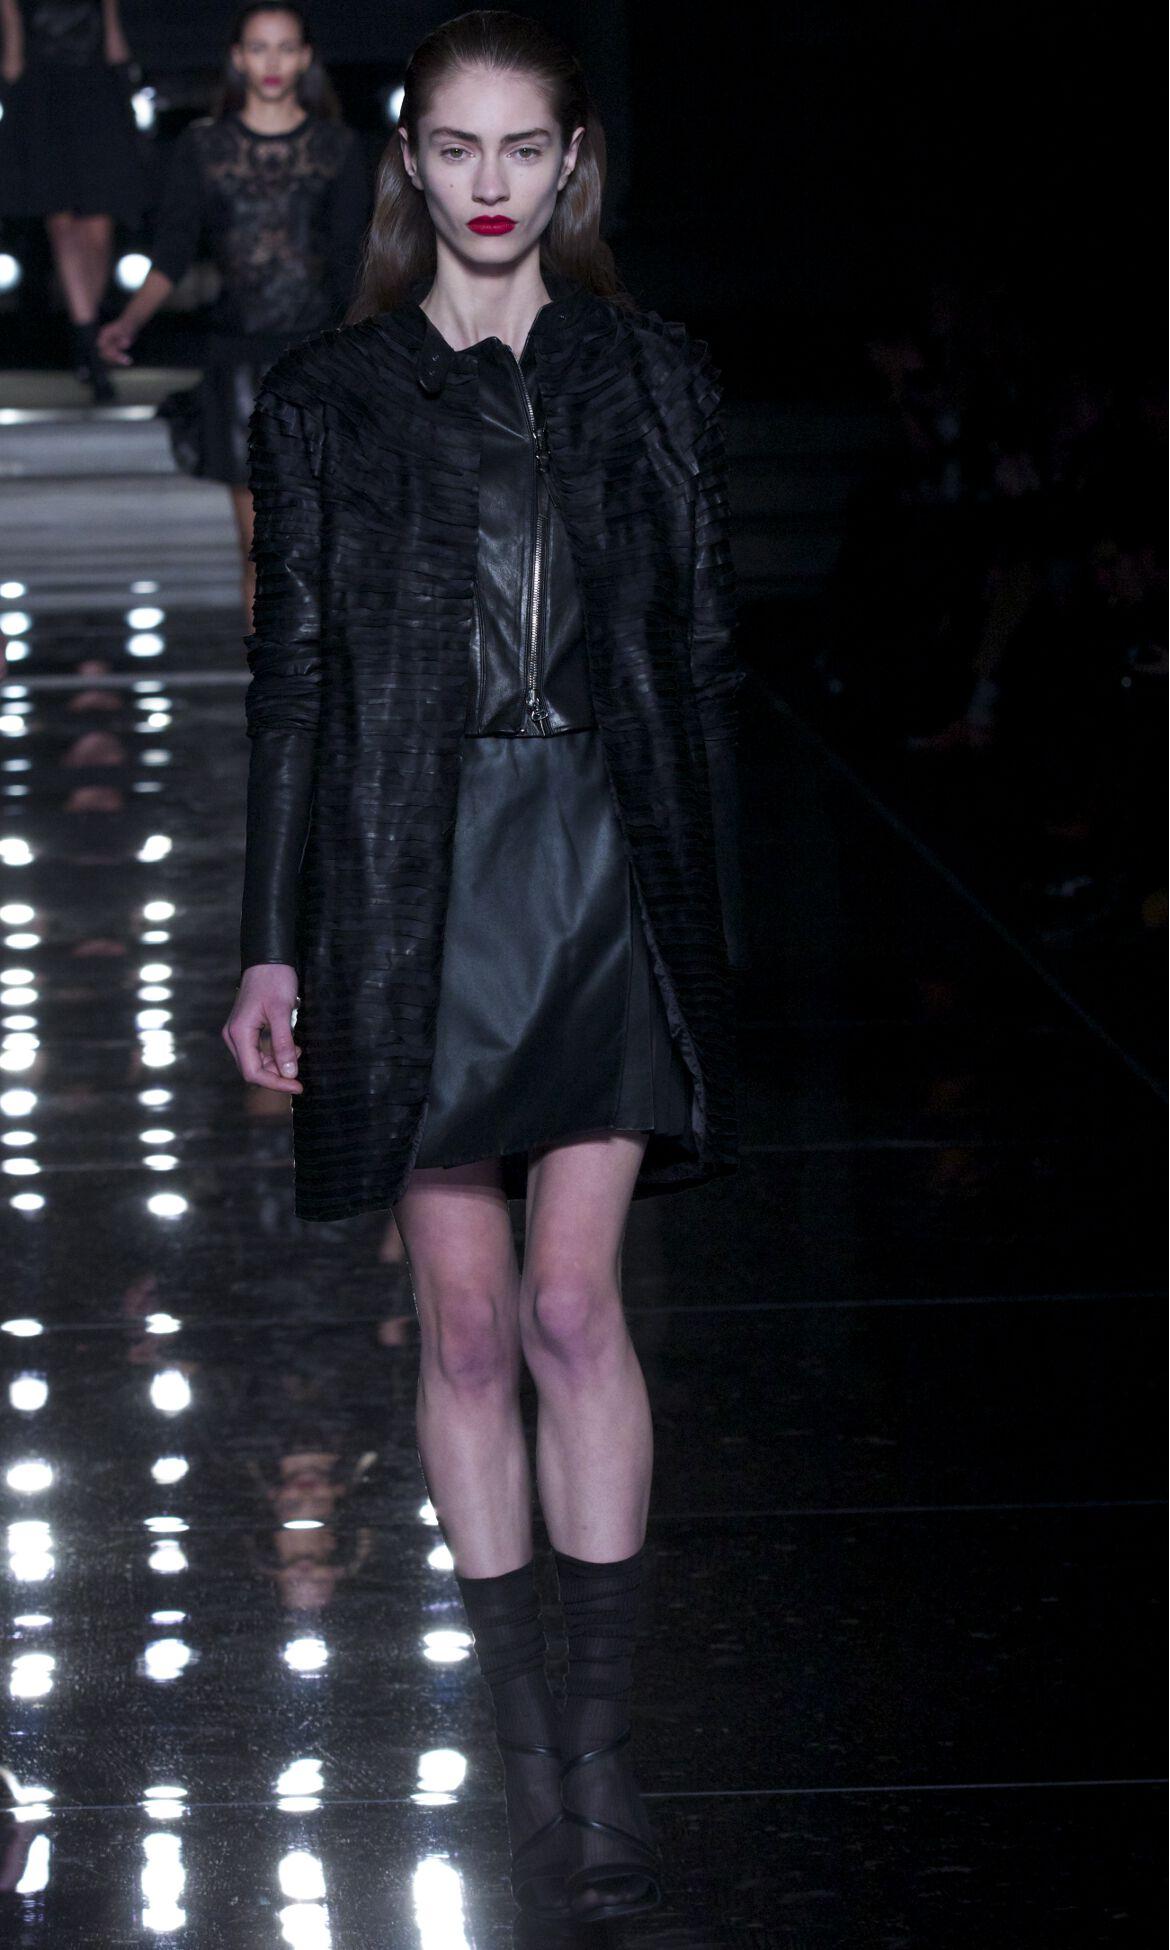 Fall Black Dress Fashion Woman